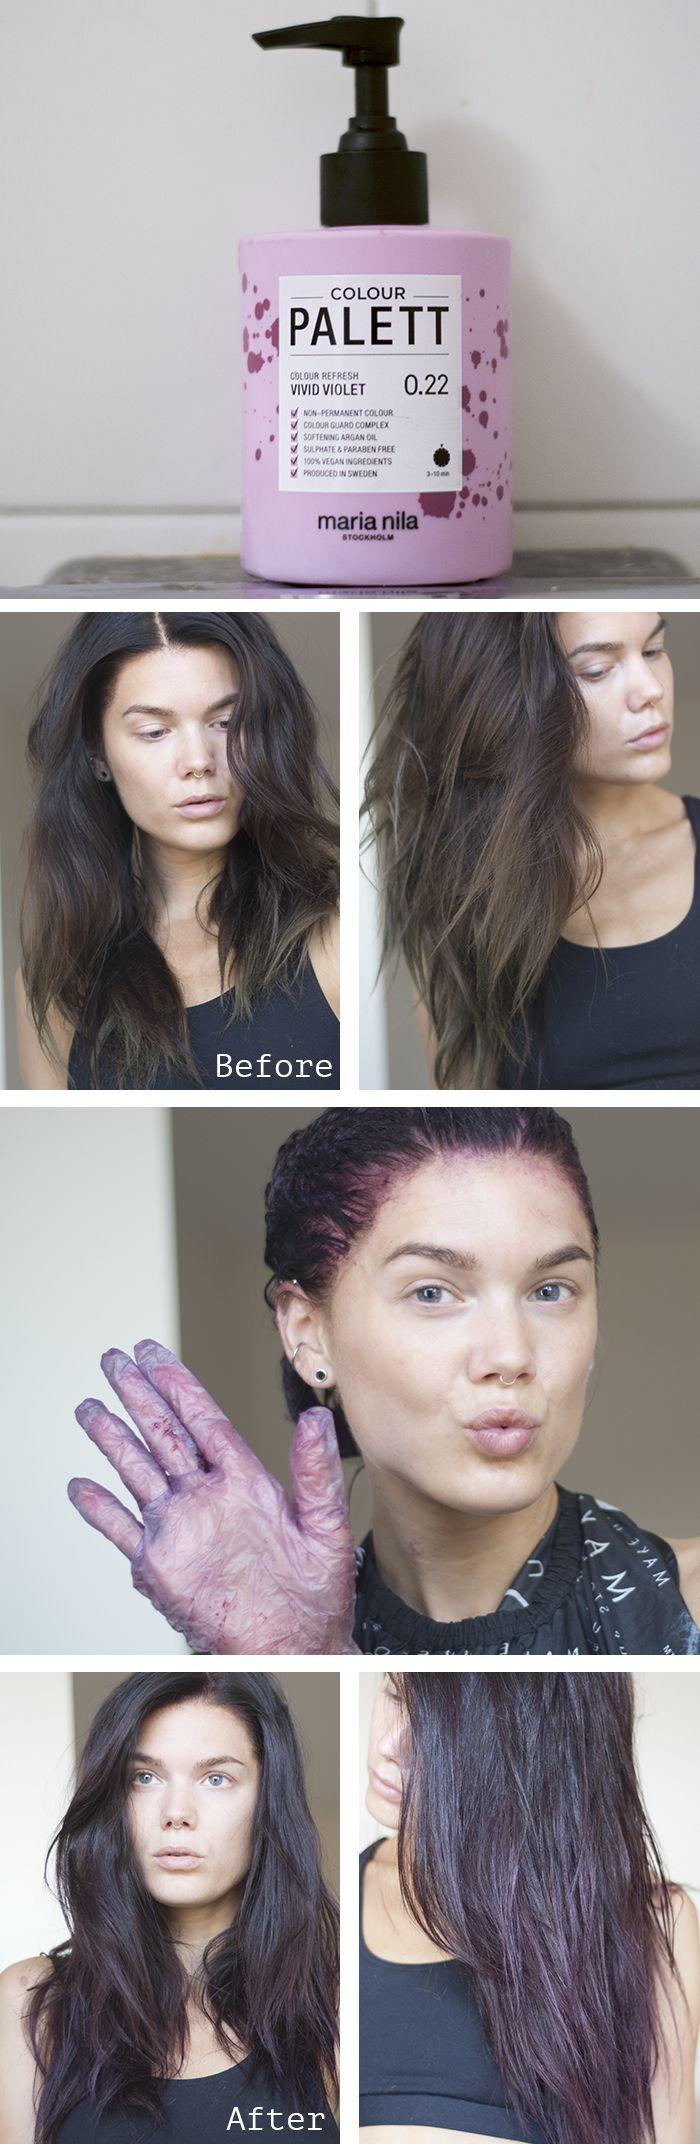 best all things hair images on pinterest gorgeous hair hair